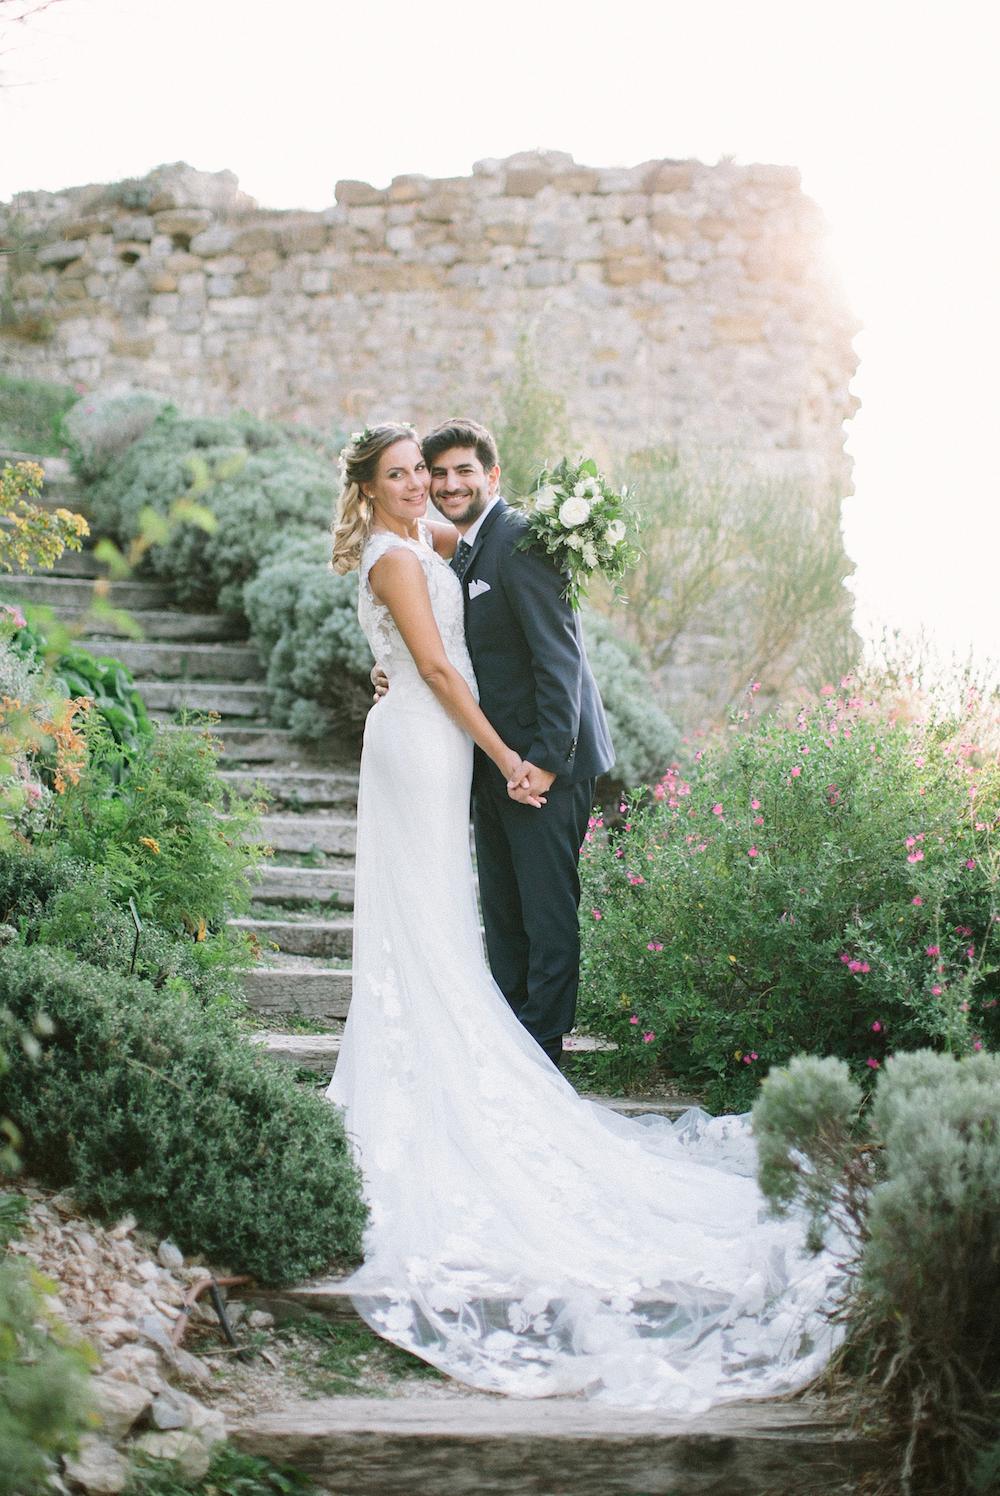 ©-saya-photography-studio-ohlala-wedding-photographer-photographe-mariage-chateau-de-la-tour-vaucros-avignon-186.jpg